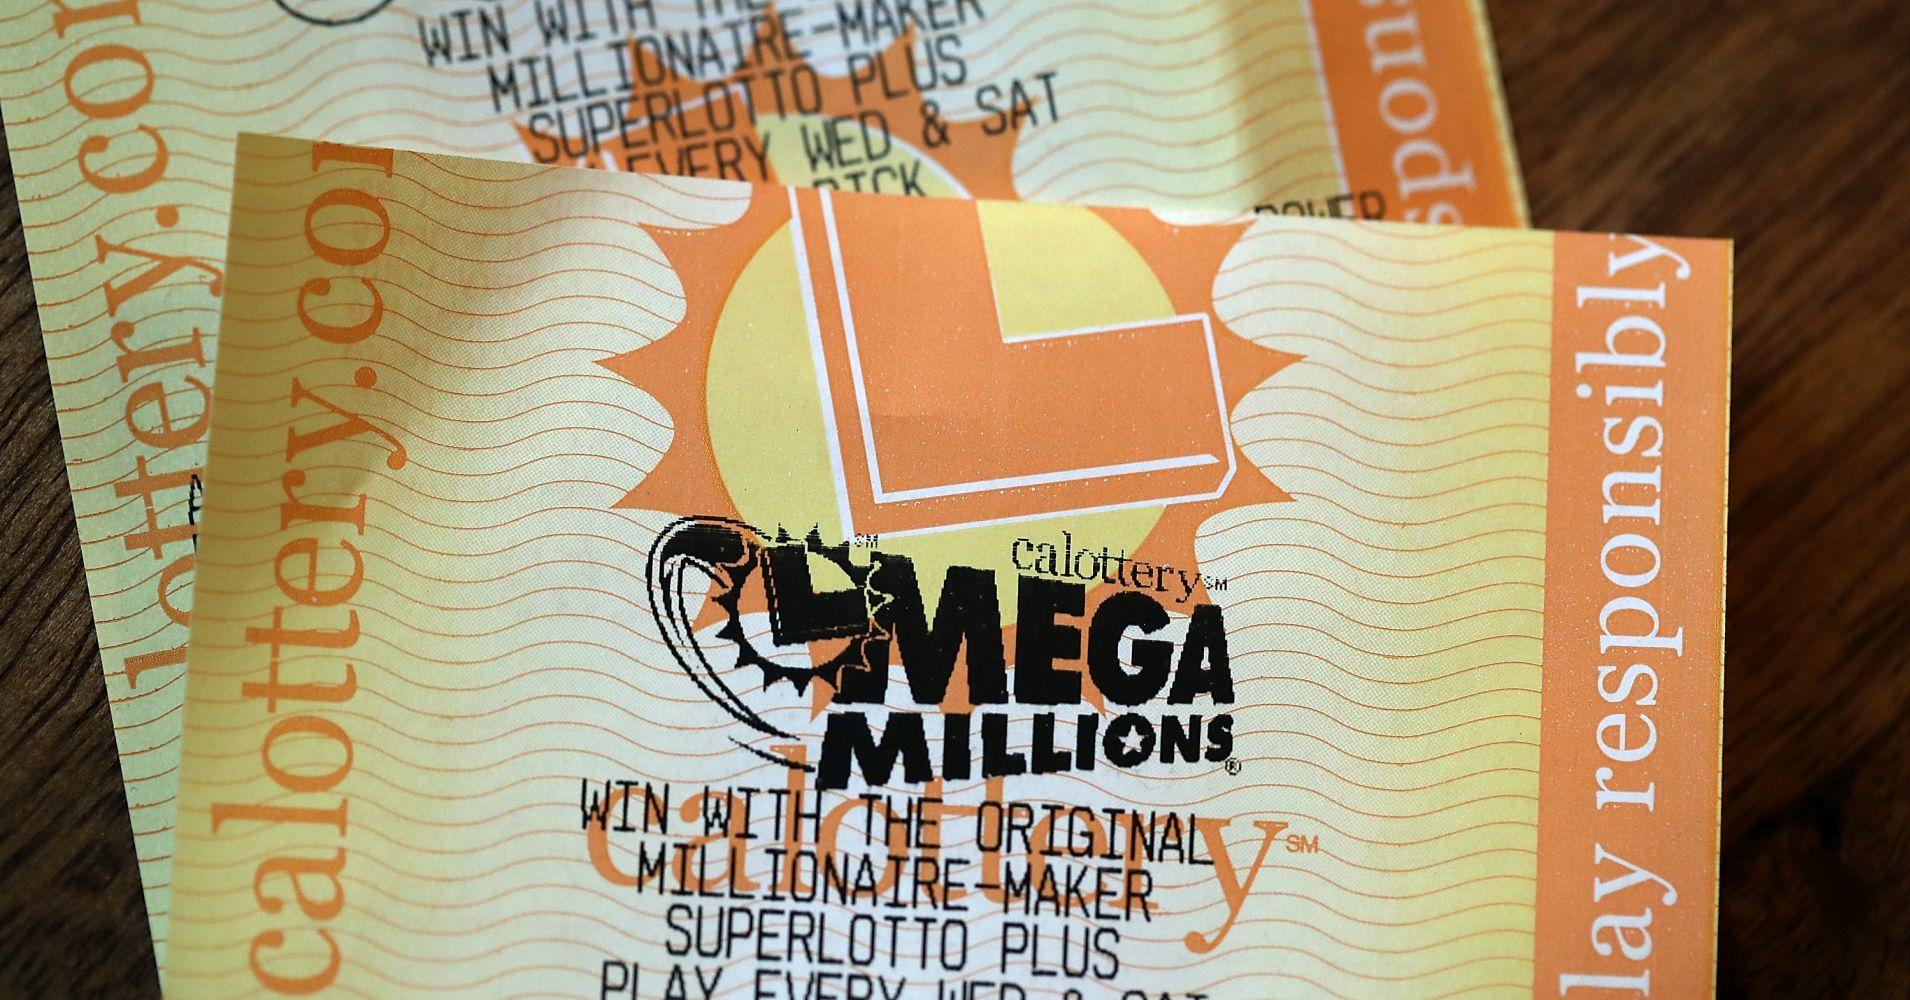 Someone hit the $267 million Mega Millions jackpot. Here's the tax bite